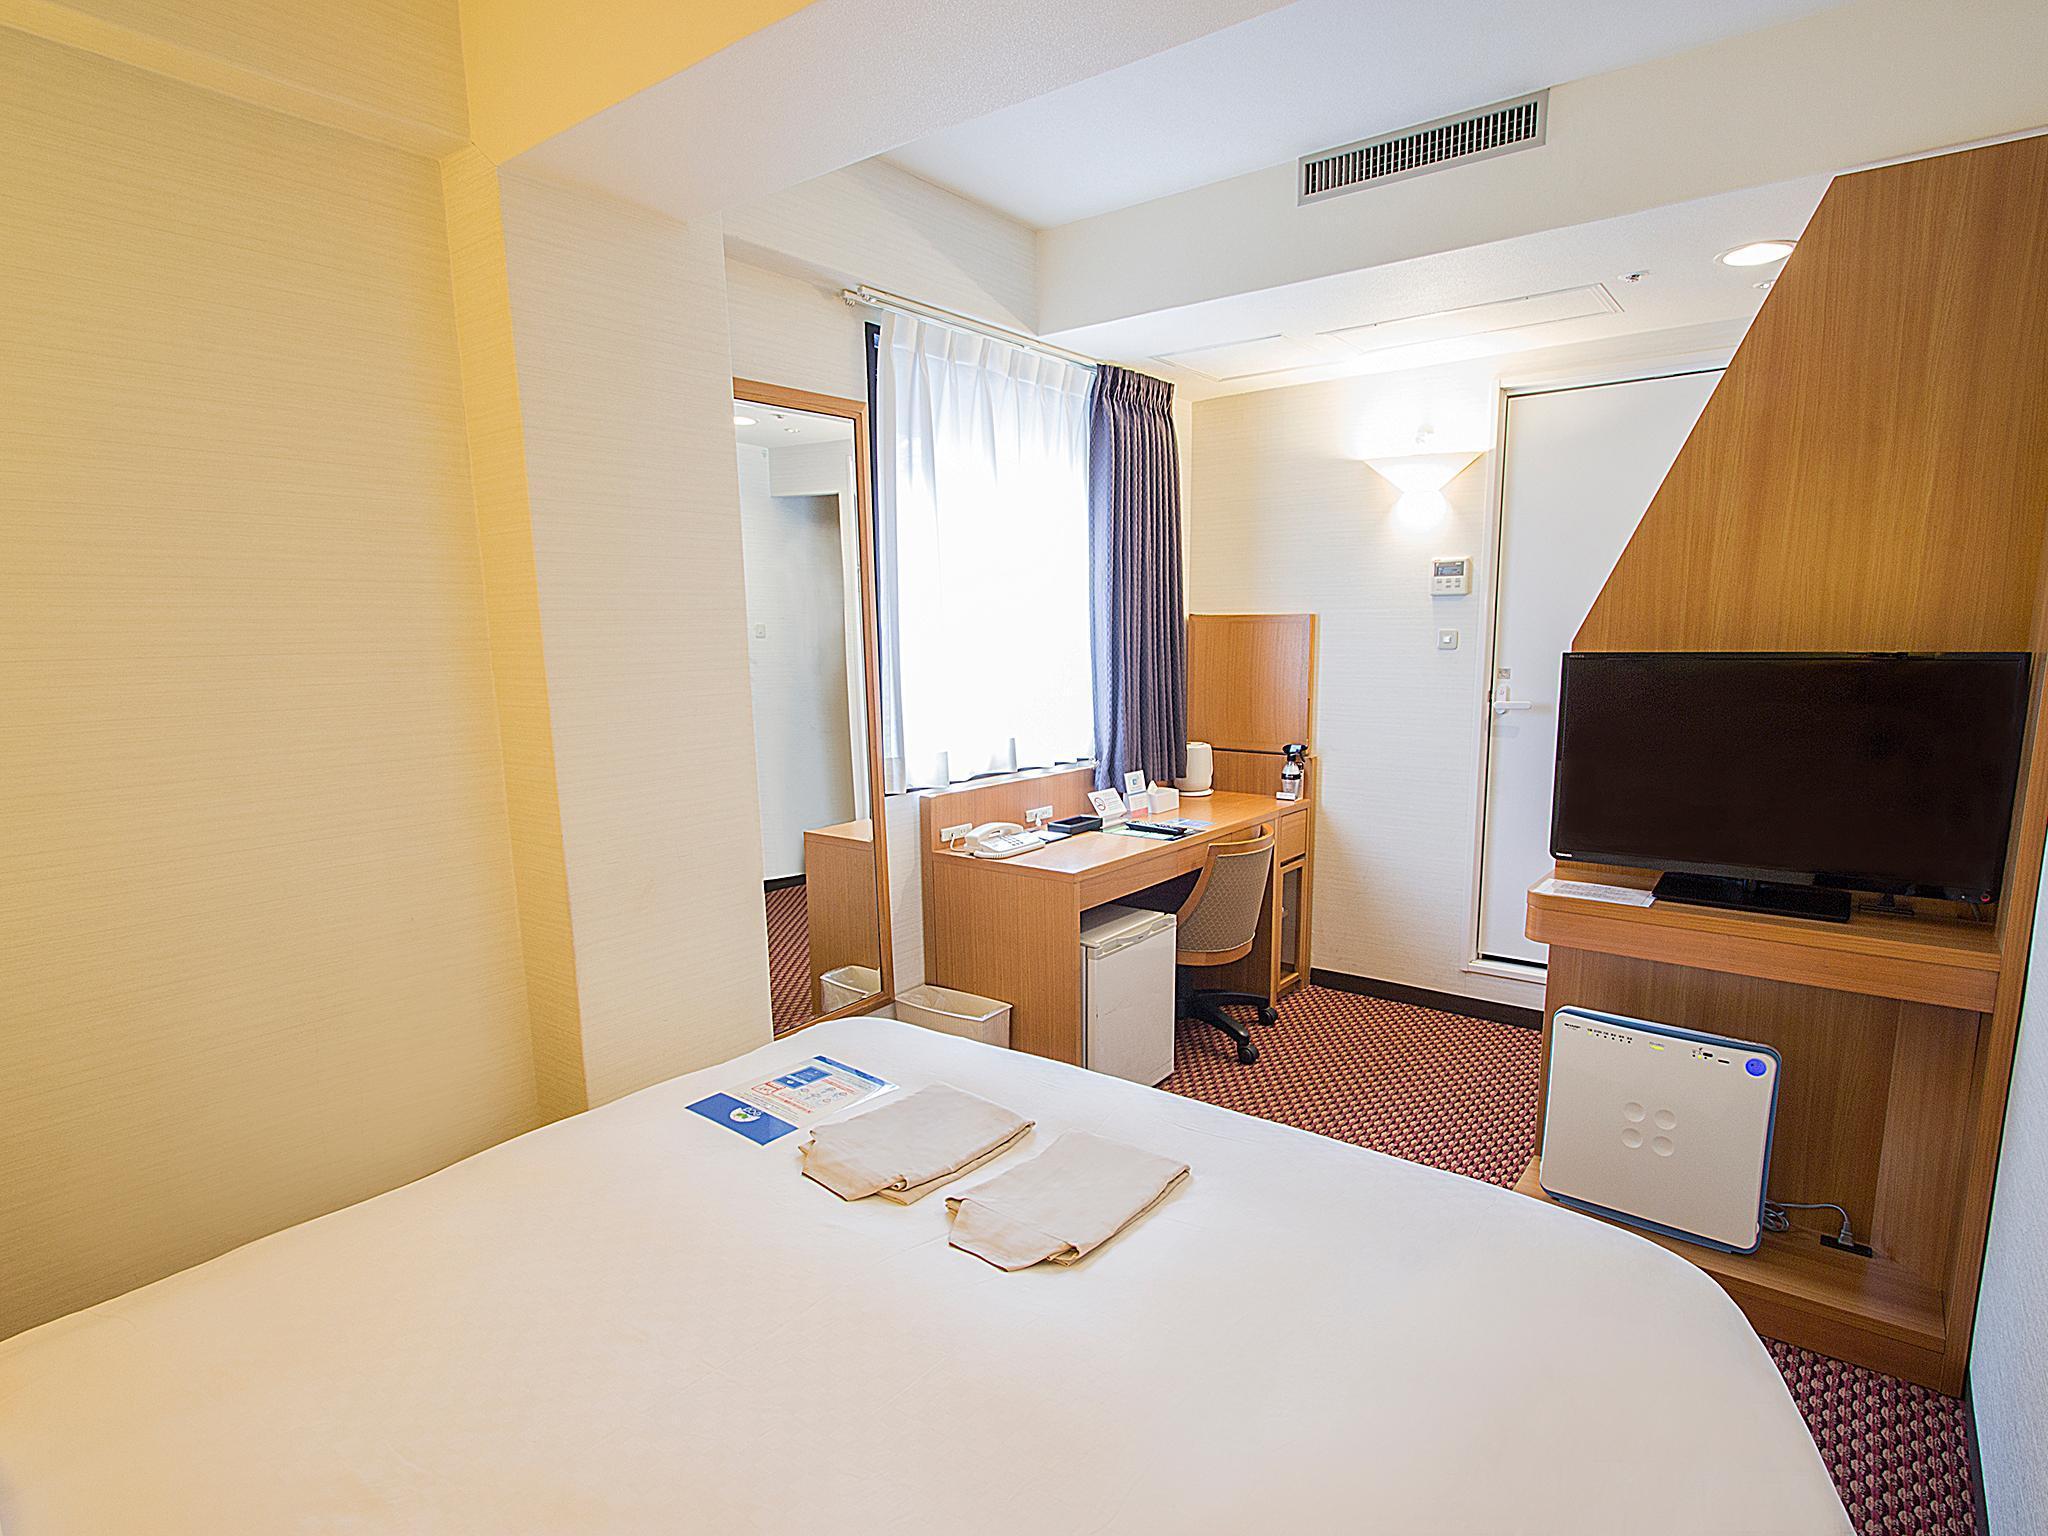 大阪心齋橋哈頓飯店 (Hearton Hotel Shinsaibashi)線上訂房 Agoda.com